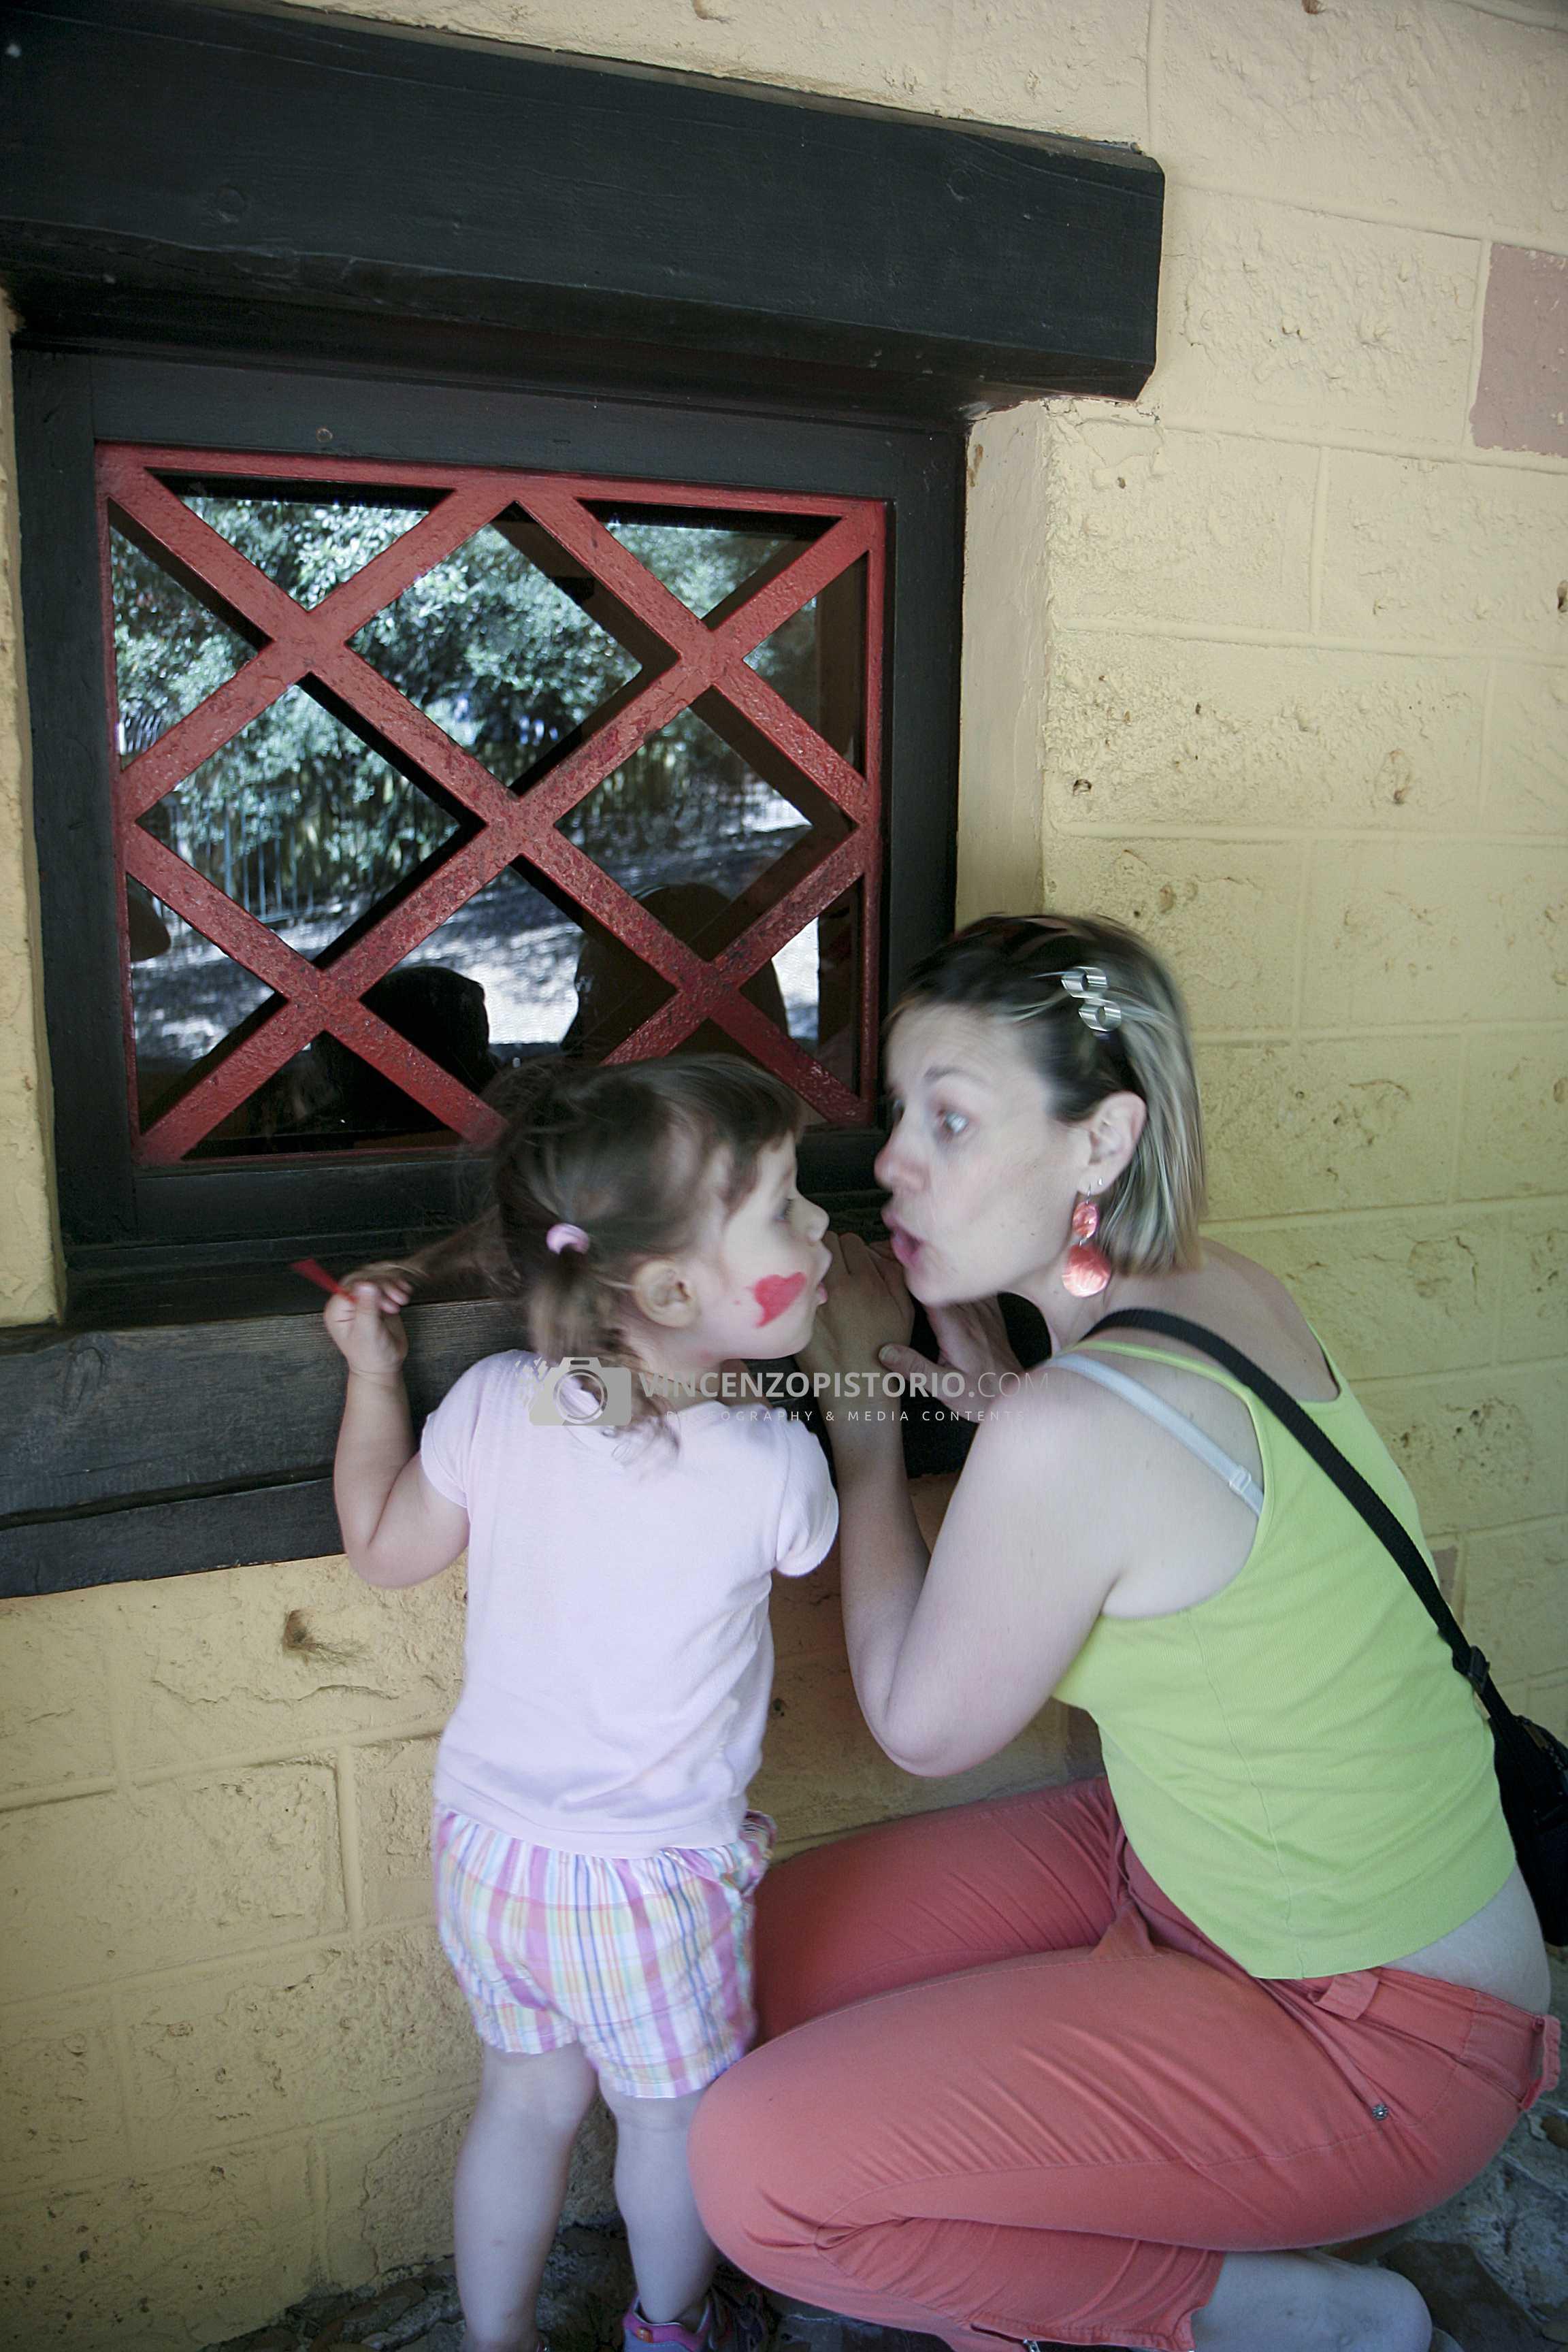 Silvia and Elisa at Pinocchio area